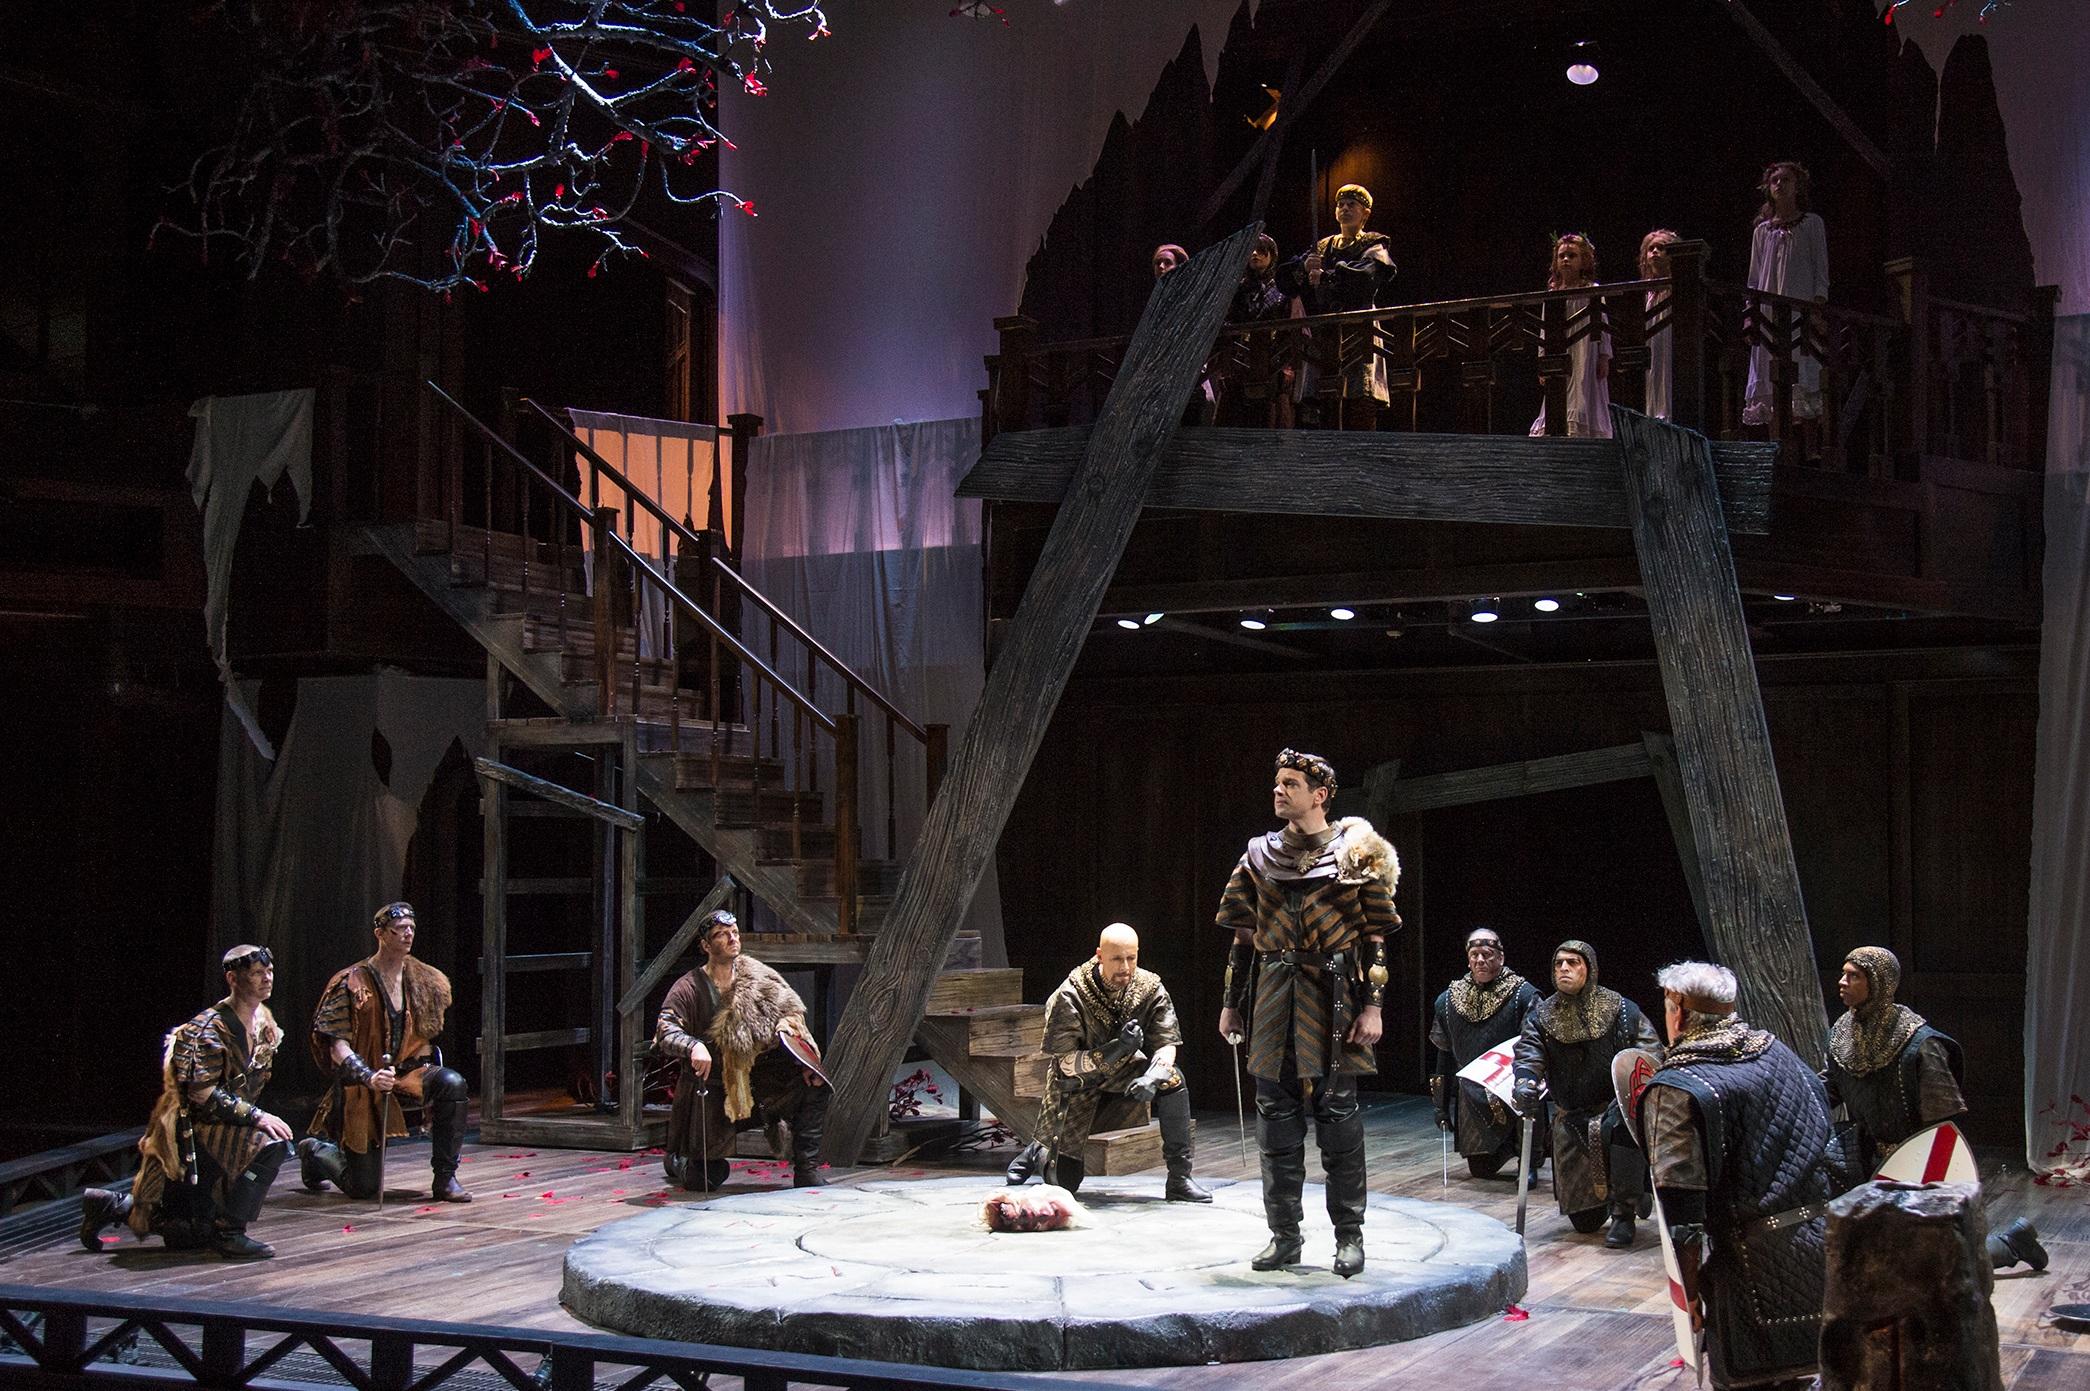 2019  Macbeth  at the Utah Shakespeare Festival, directed by Melissa Rain Anderson.  Photo by Karl Hugh